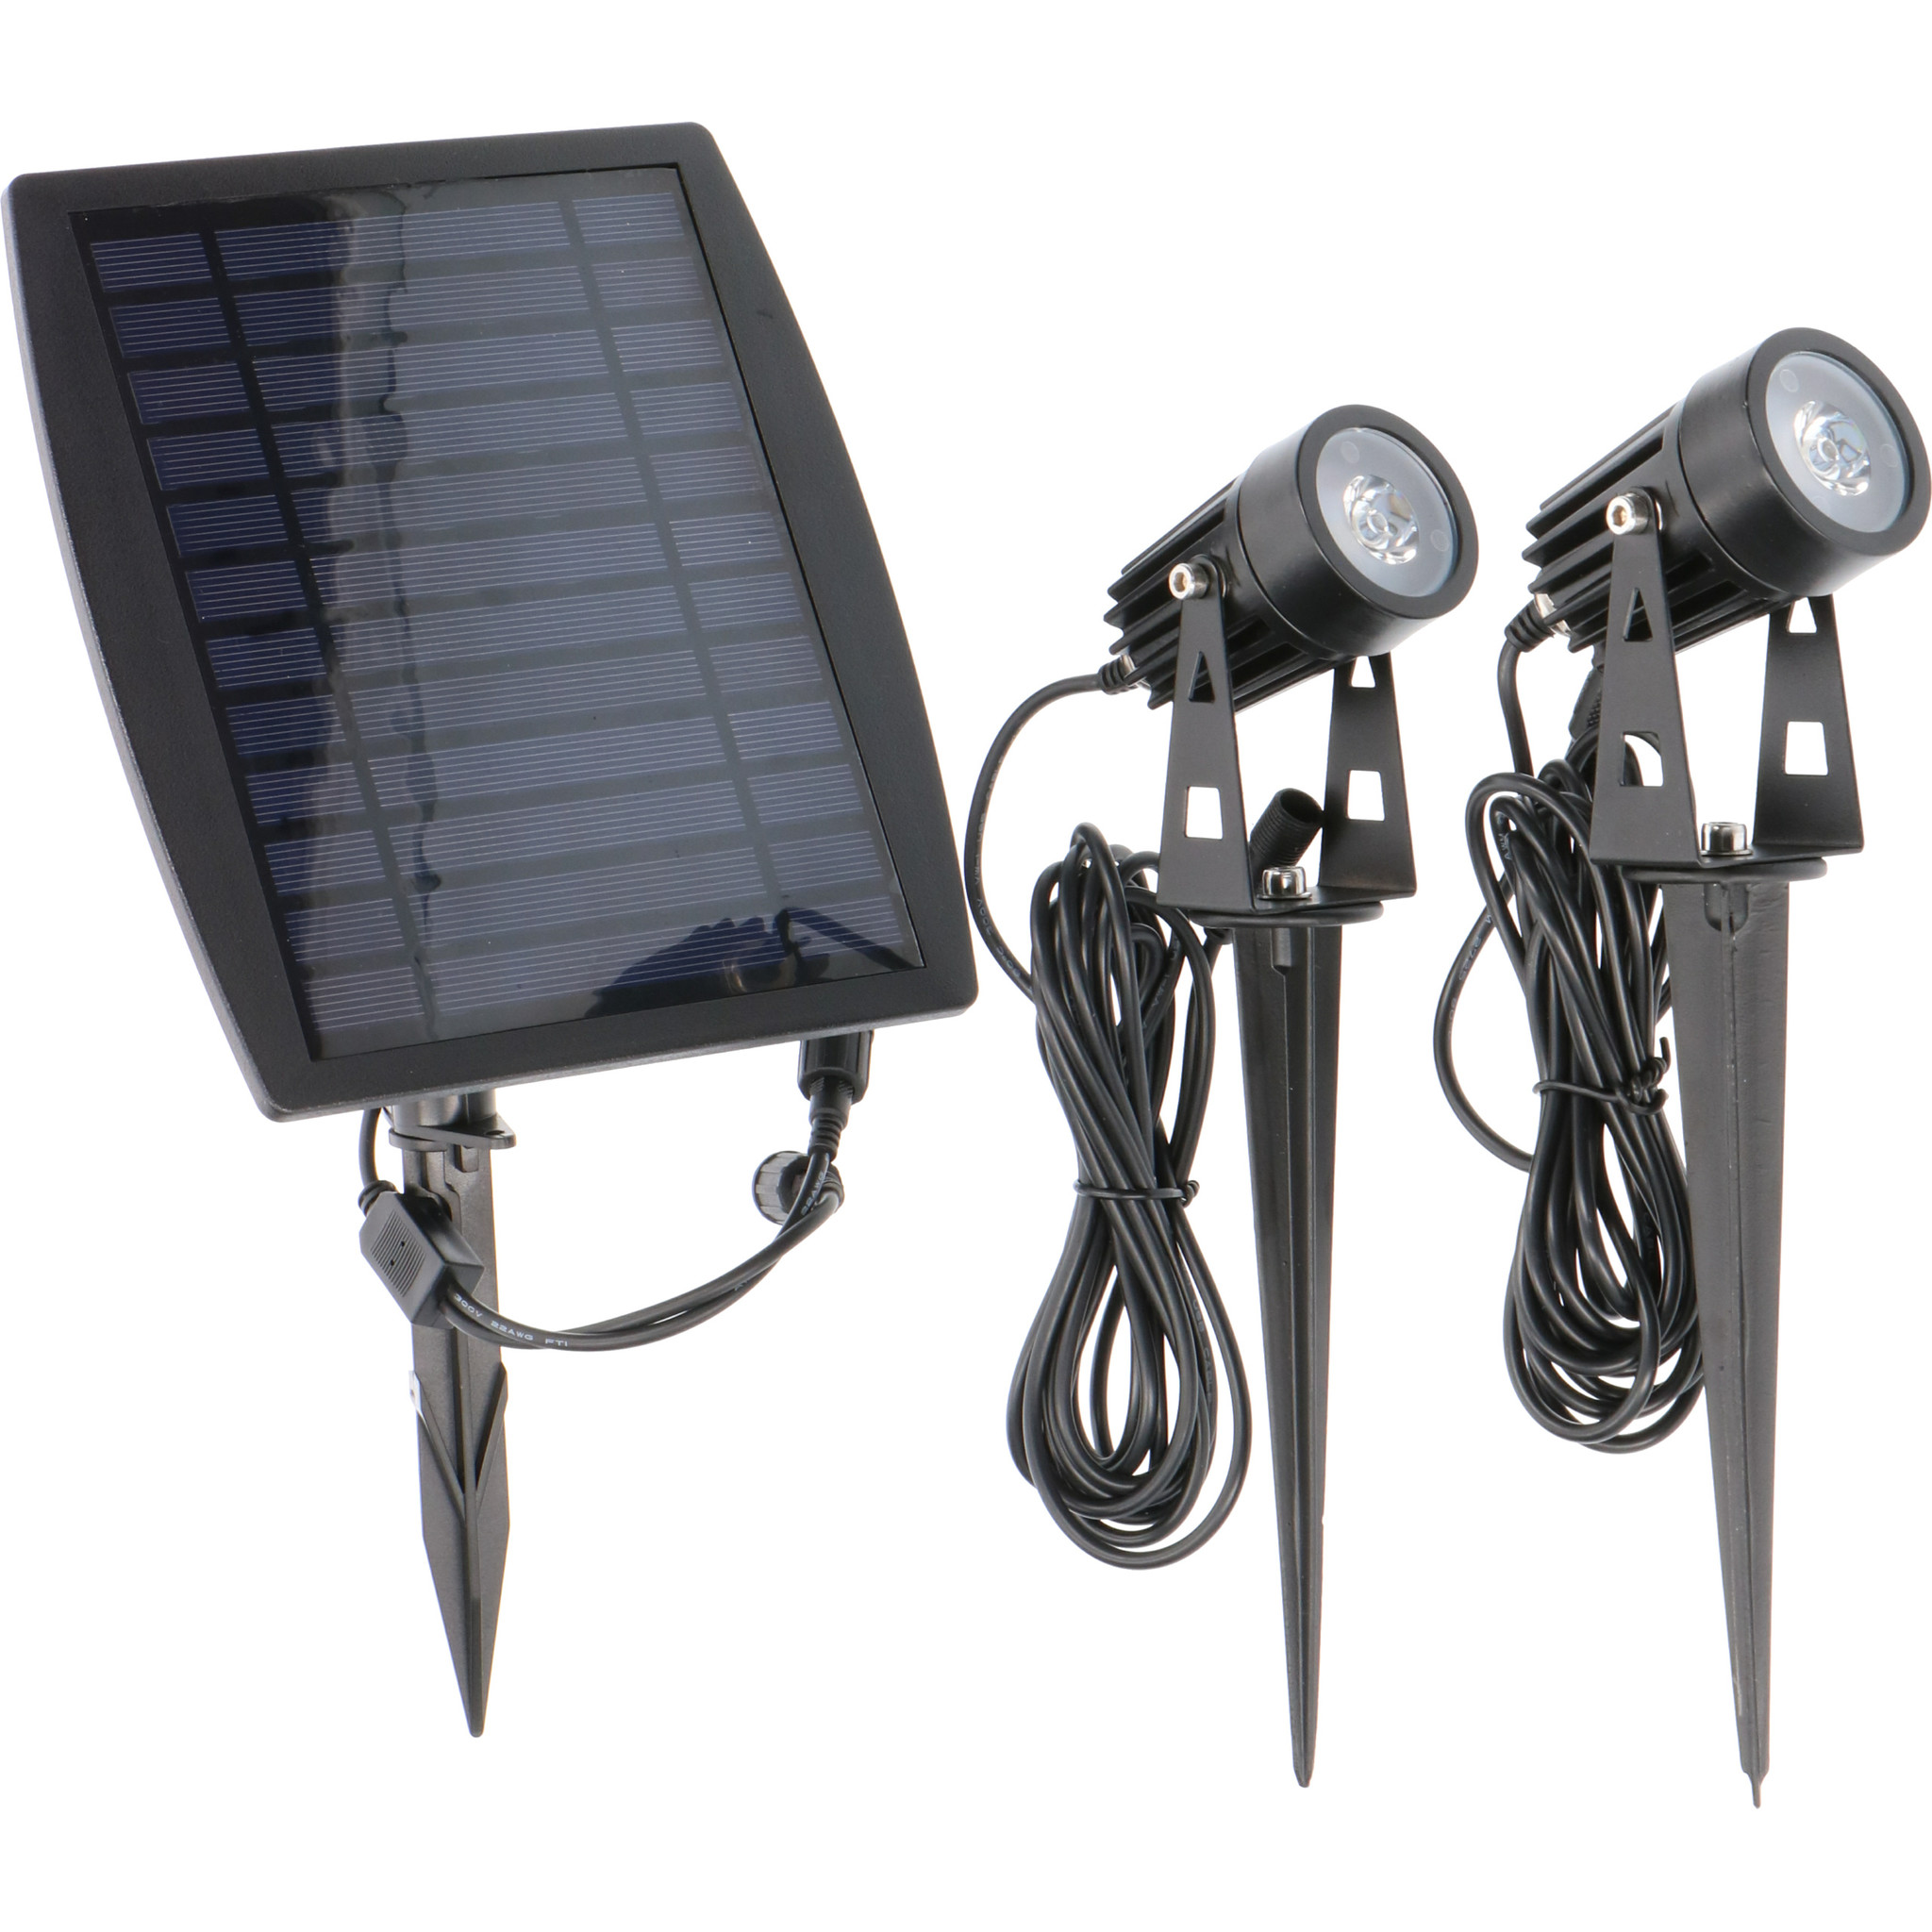 LED Prikspot Solar Dubbel - IP65 - Geïntegreerd LED - SALE: 20%